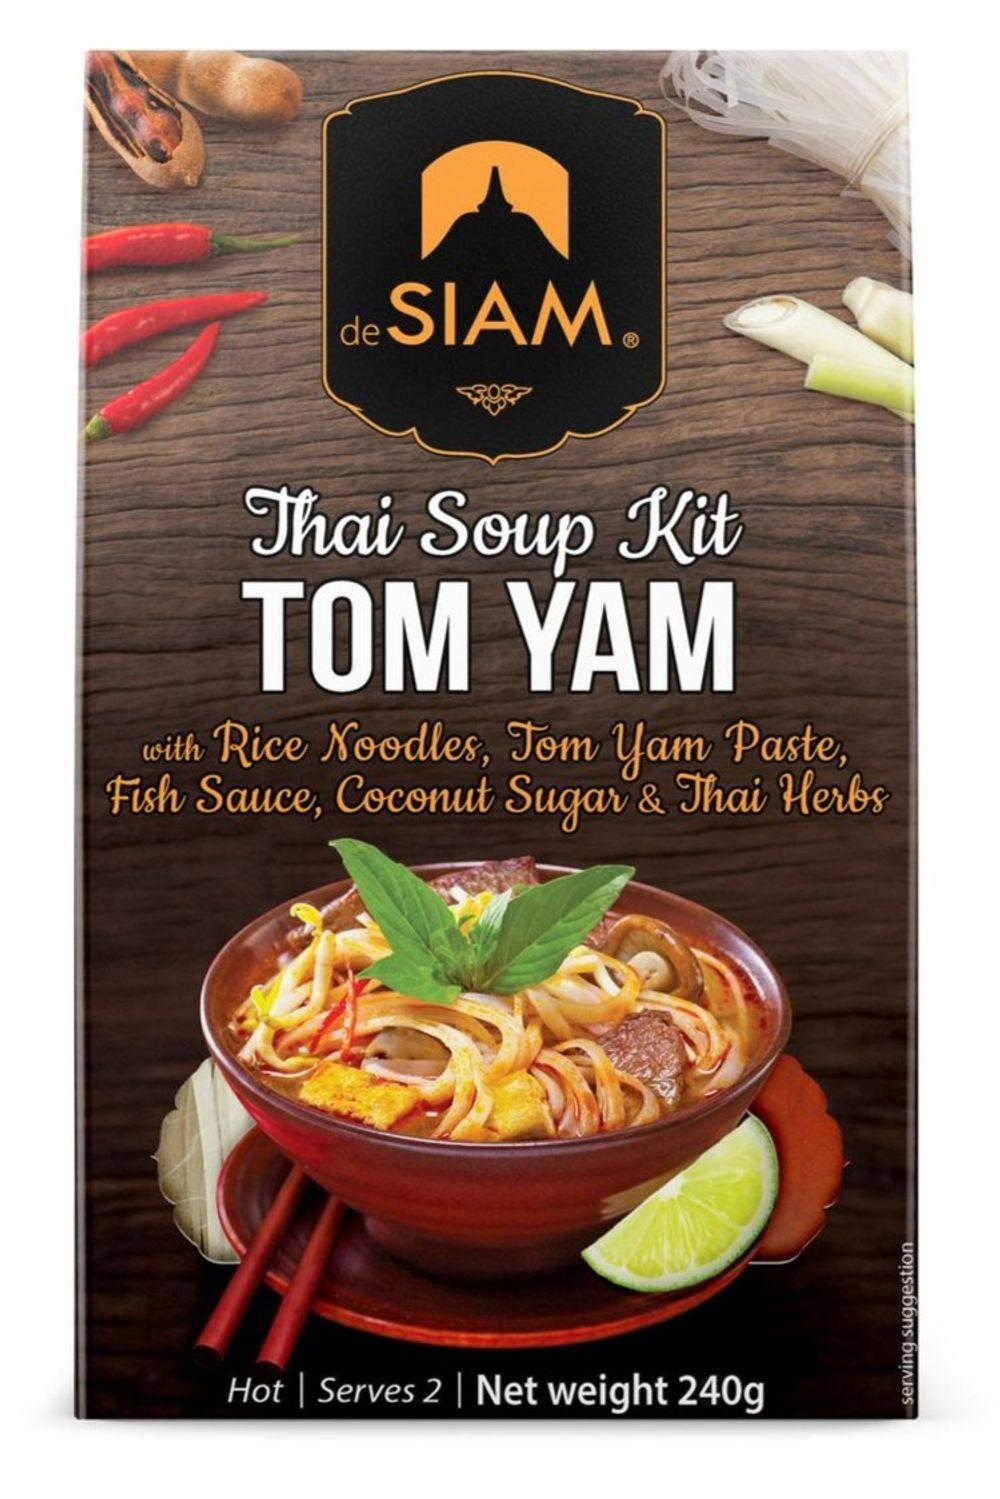 Tom Yam Soup Kit